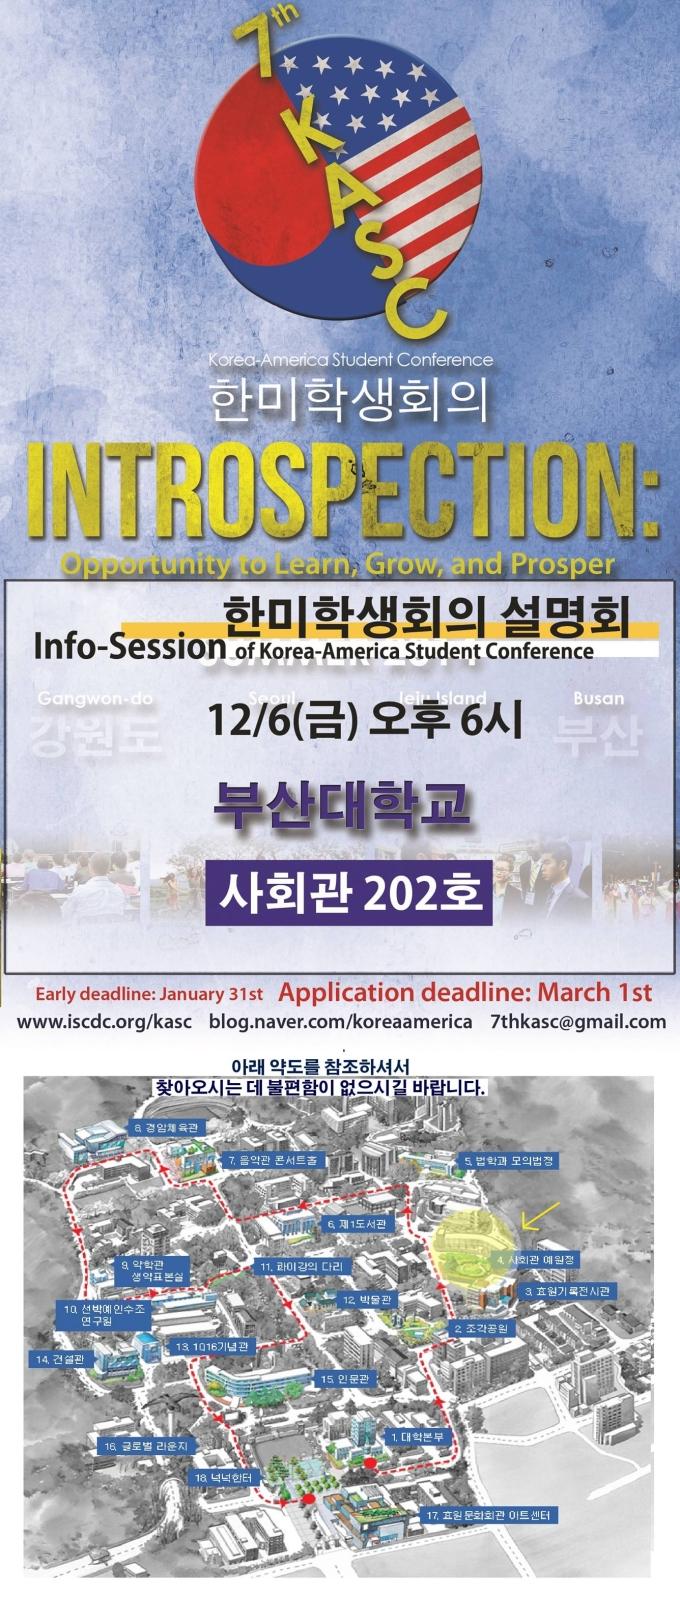 Korea-America Student Conference 2014